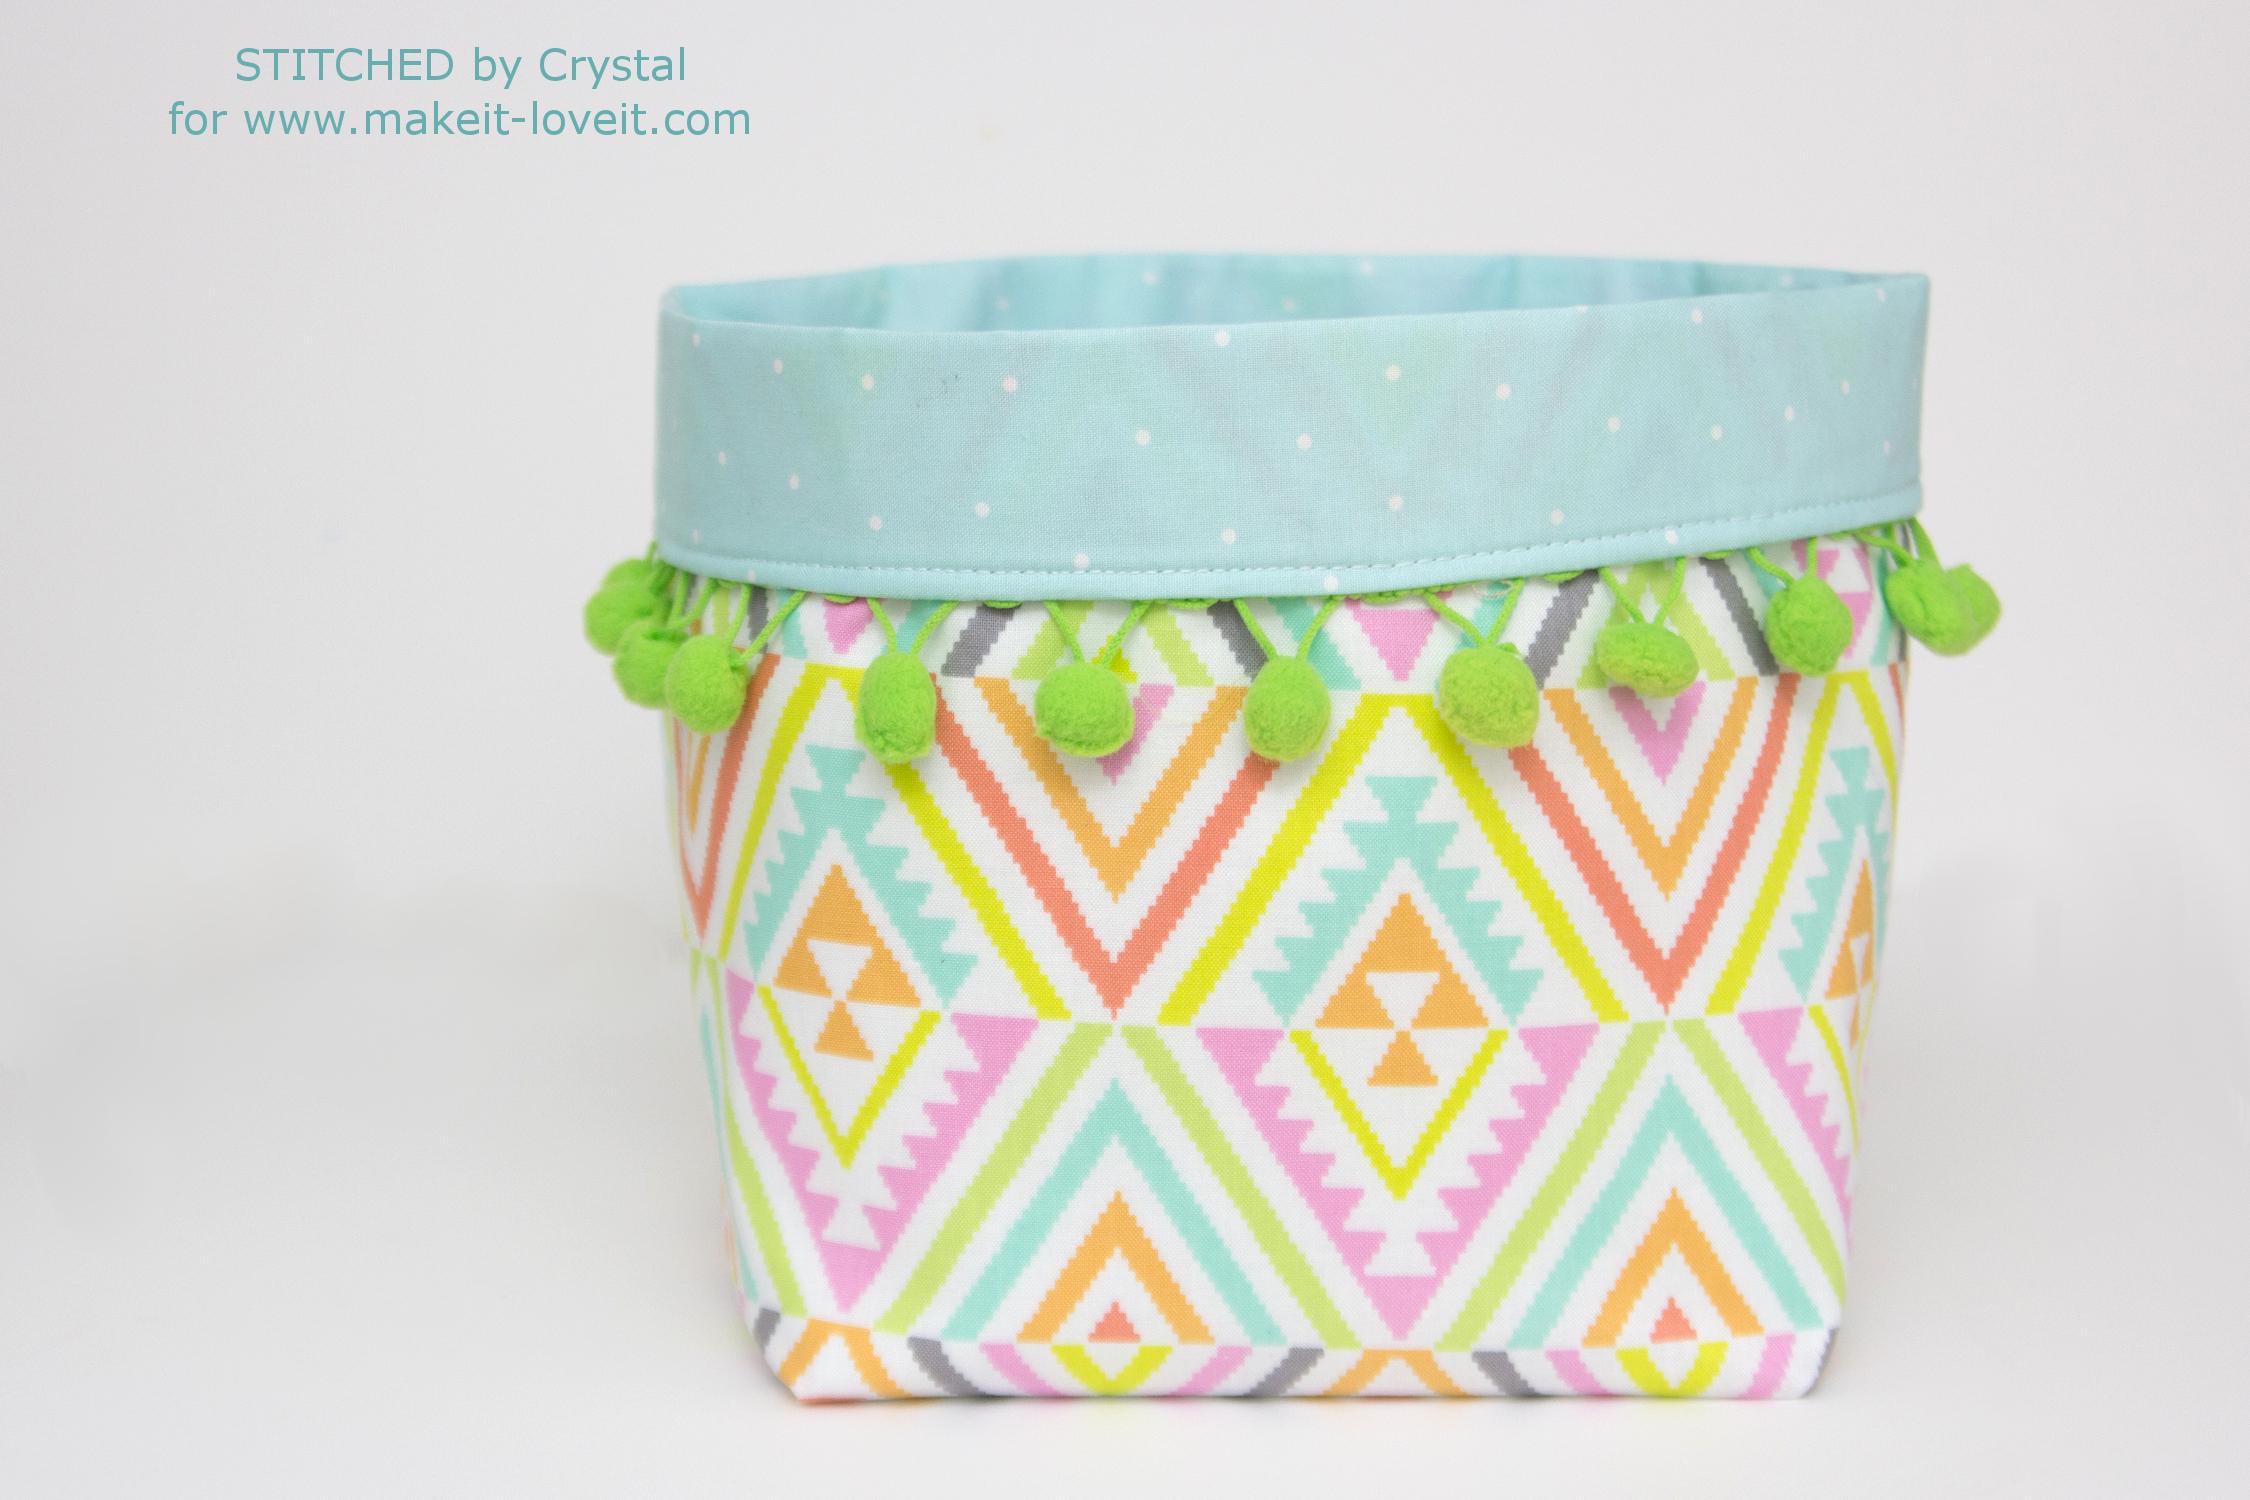 Pom Pom Trimmed Fabric Bins Tutorial...3 different sizes! | via www.makeit-loveit.com